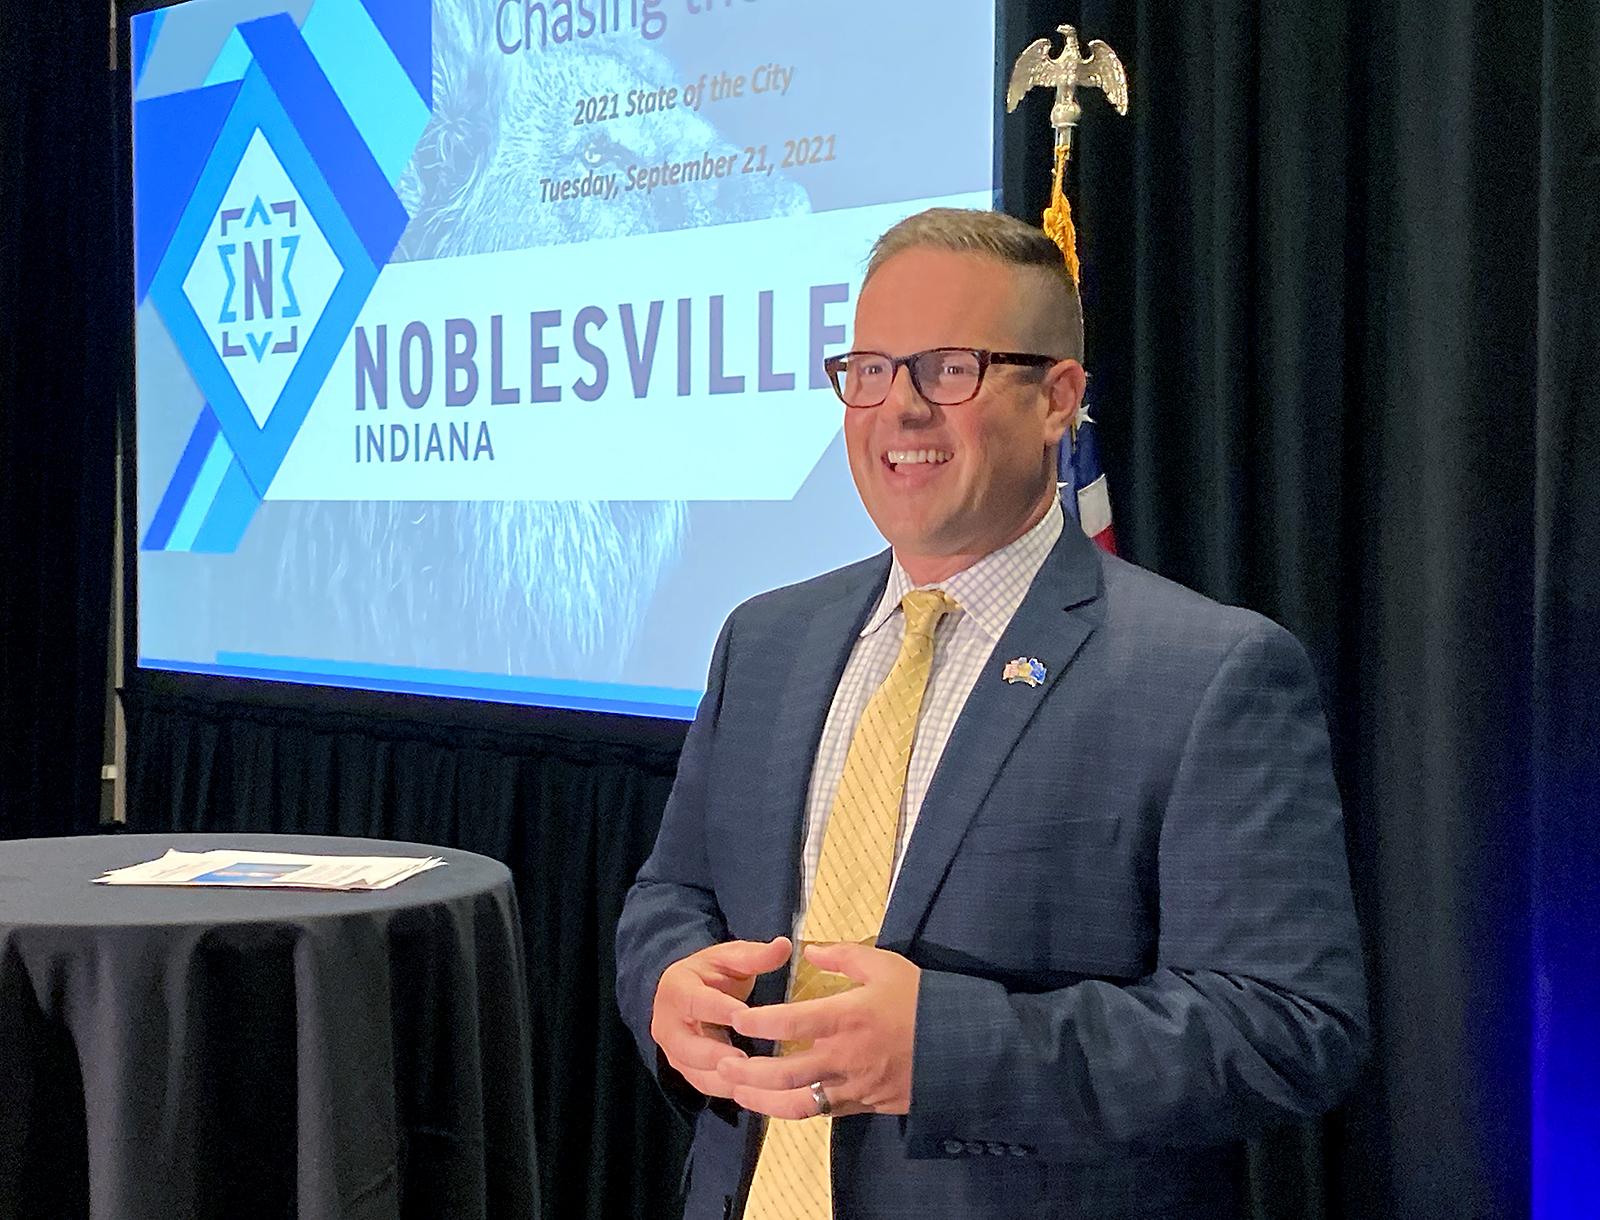 Noblesville Mayor Jensen Delivers Second 'State of the City' Address